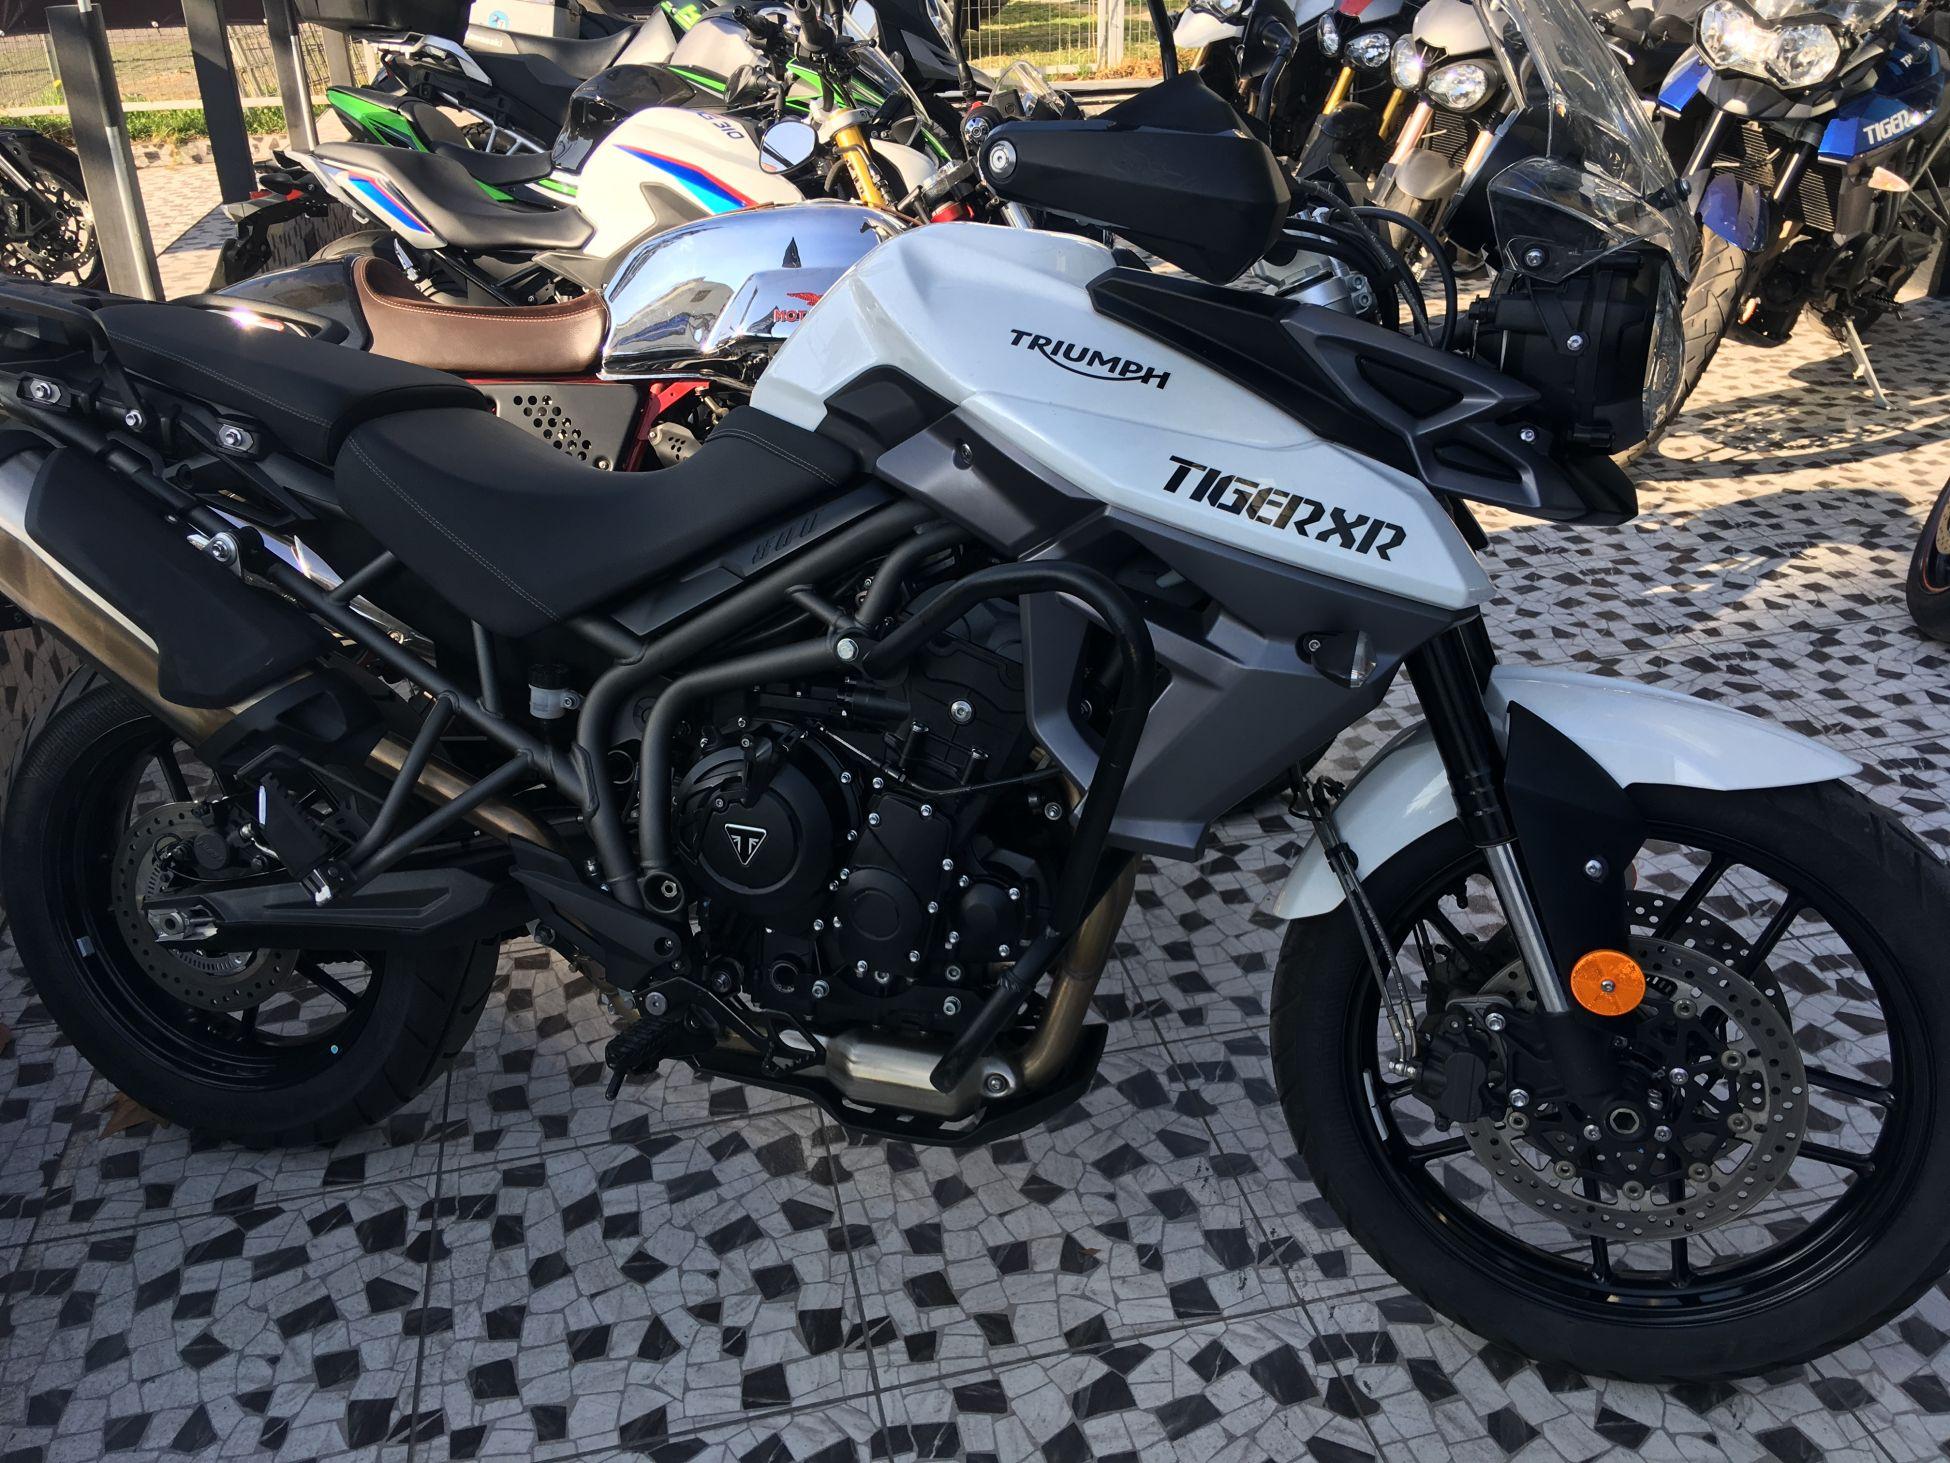 TIGER 800 XR